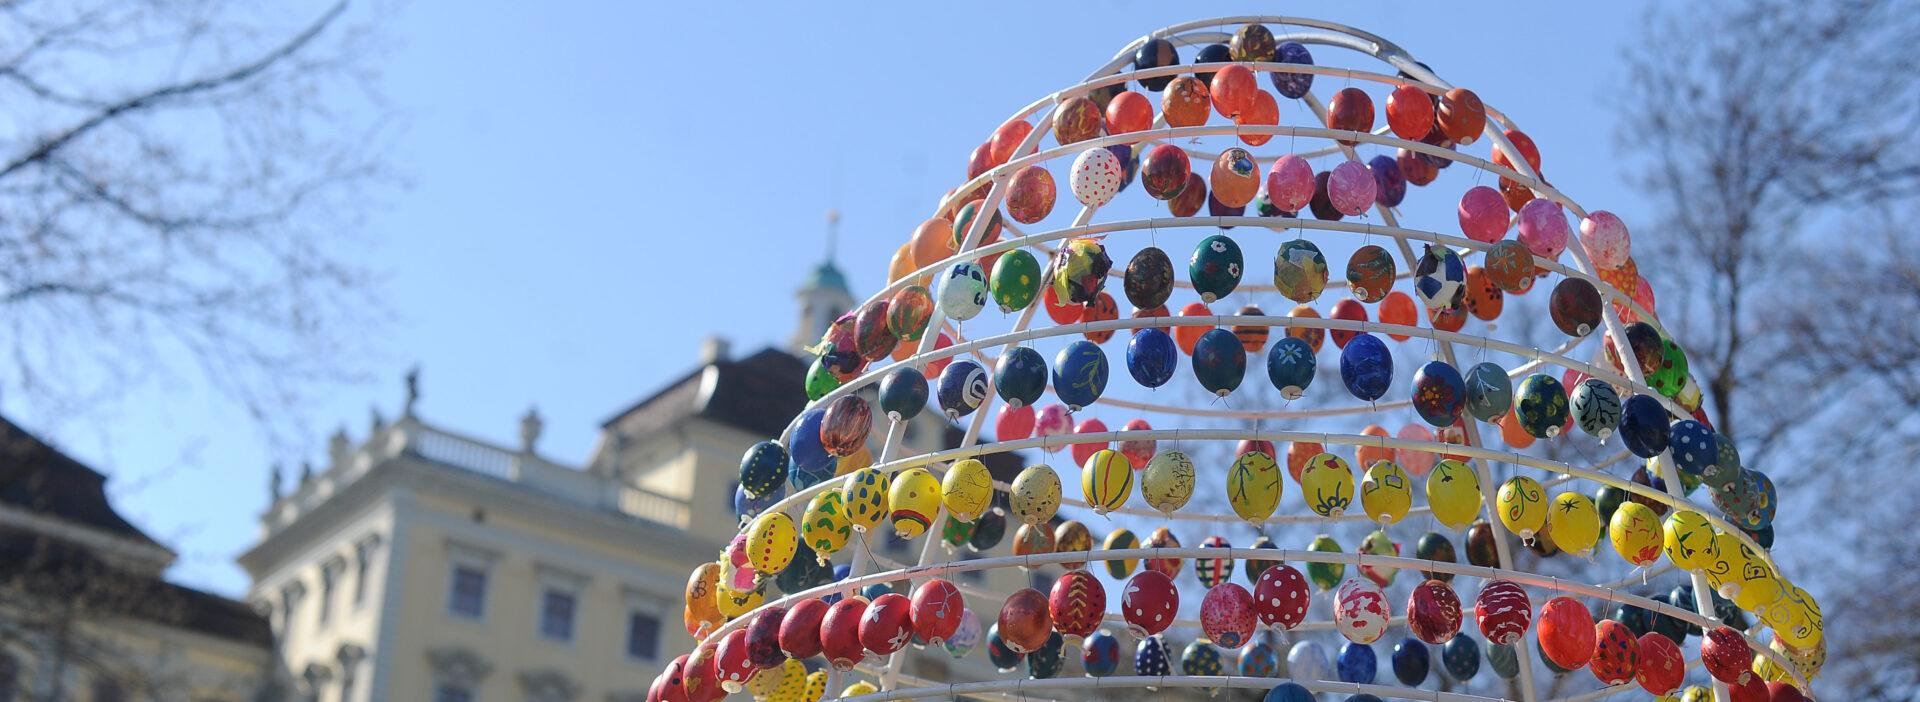 Fruehlingsausstellung Ludwigsburg